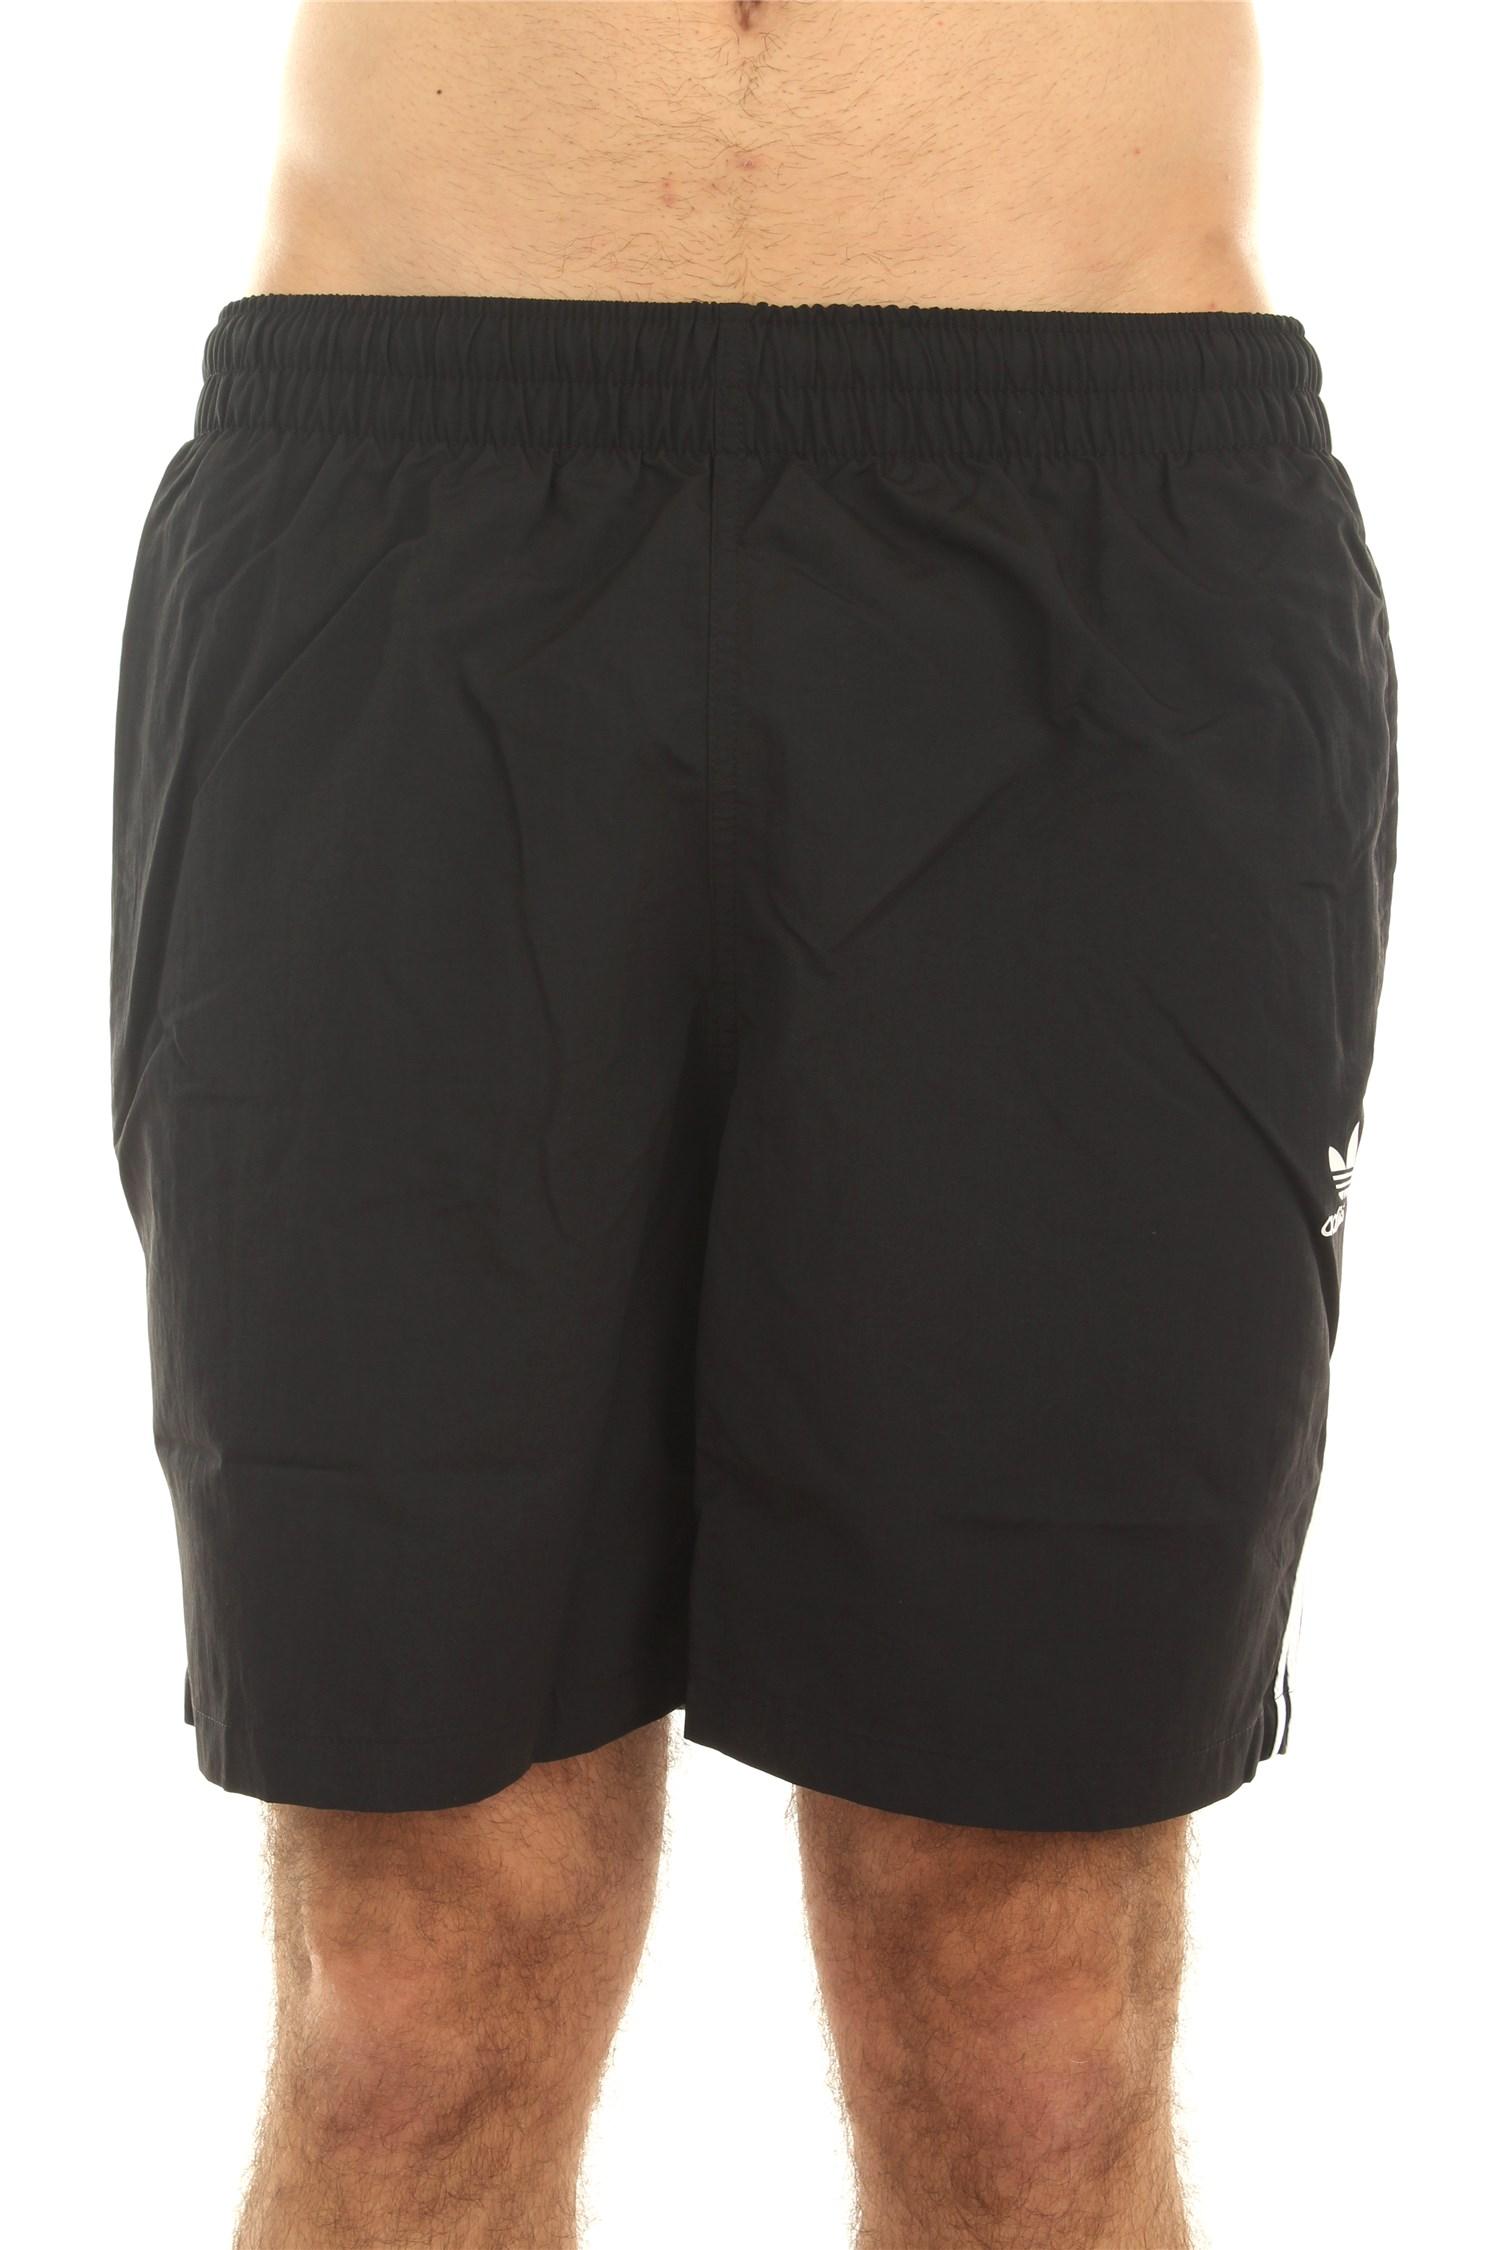 Adidas Swimwear Sea shorts Man Black